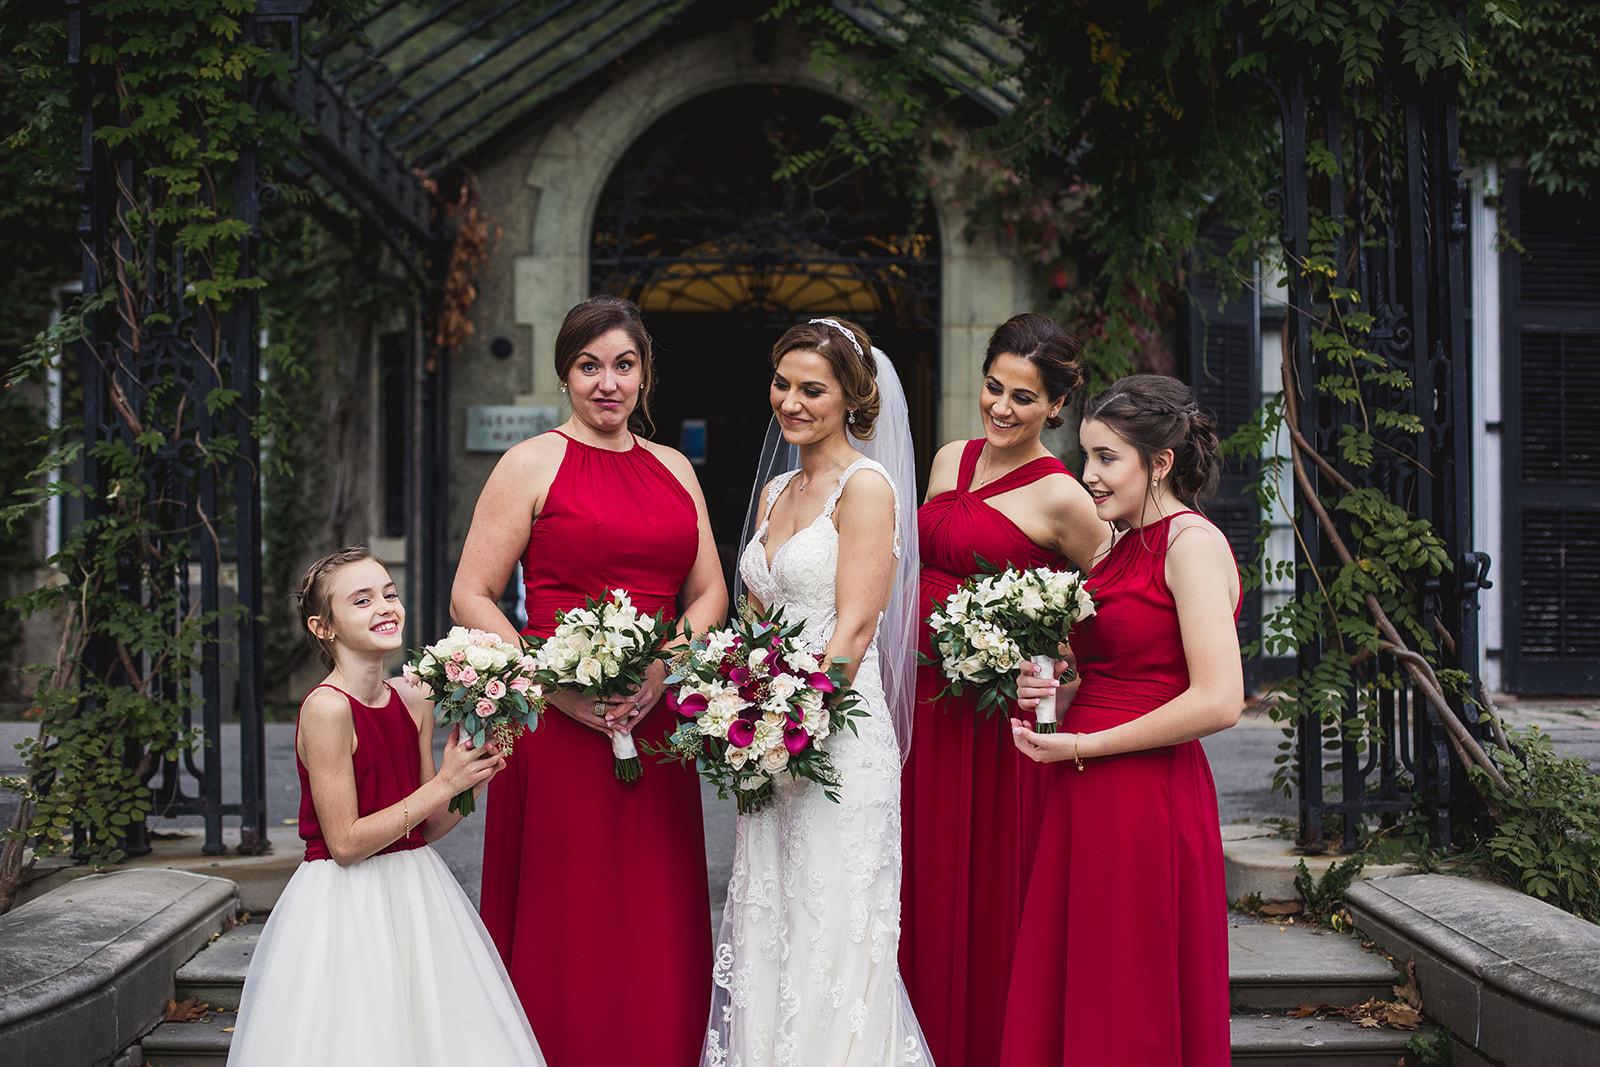 glendon college wedding photos